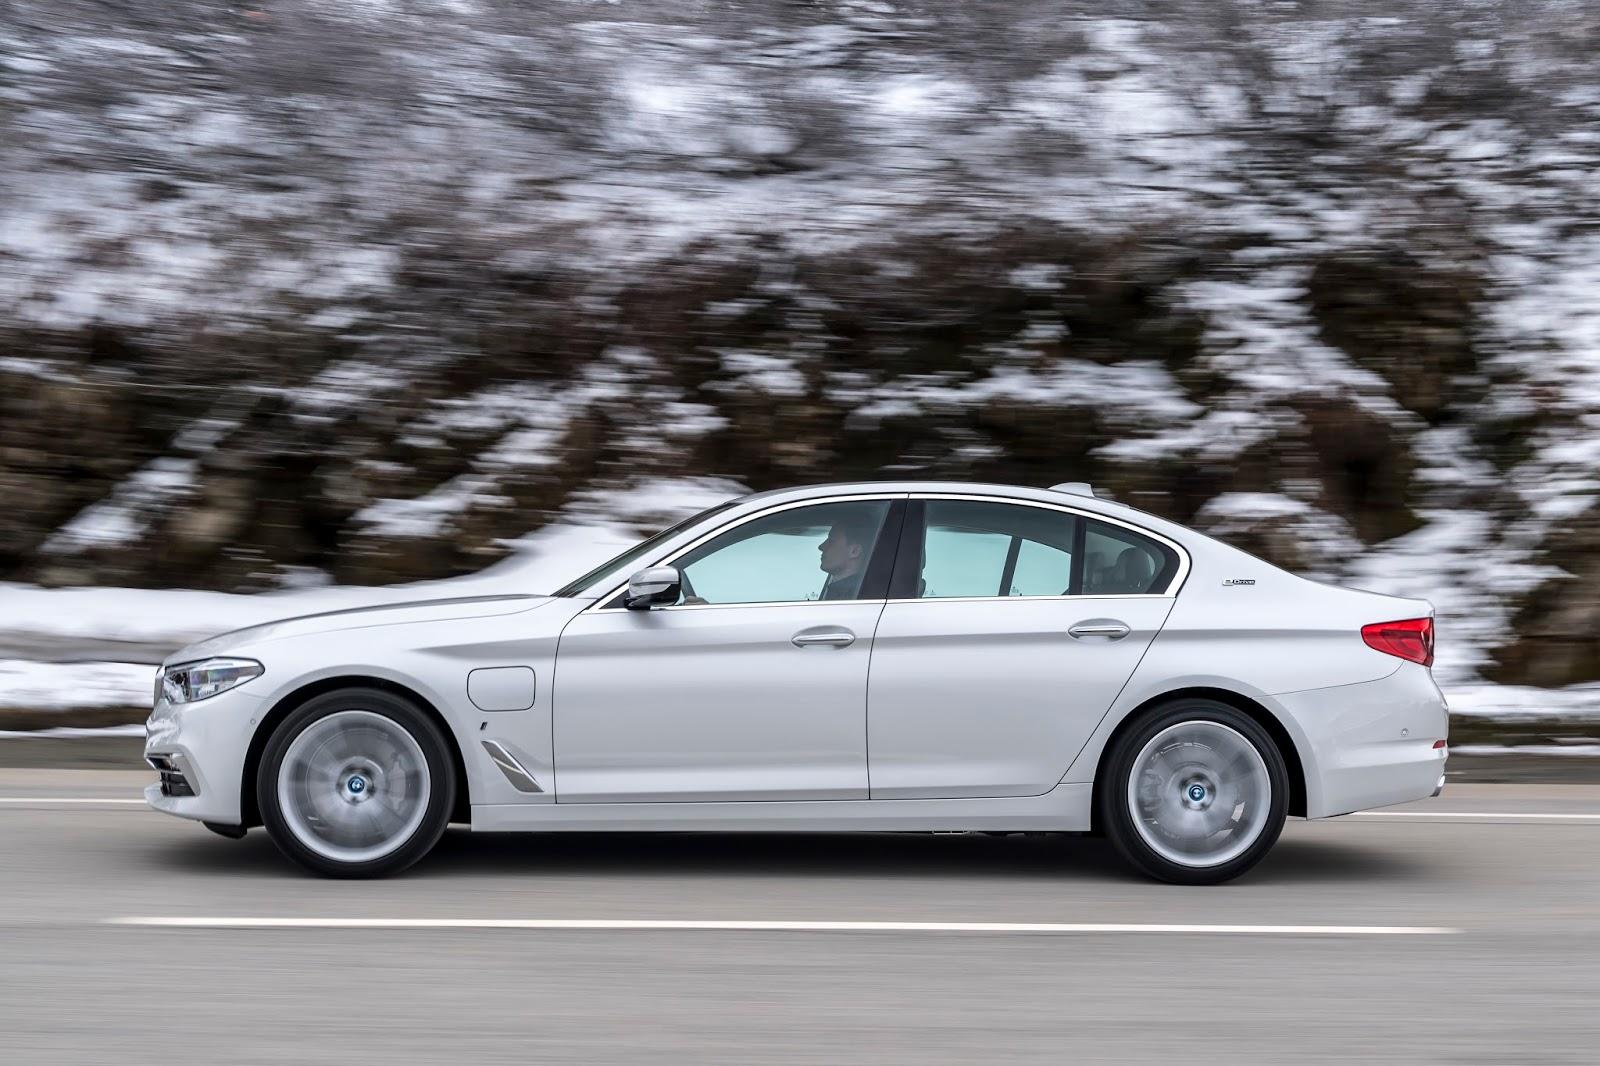 P90256341 highRes the new bmw 530e ipe Η BMW 530e iPerformance φέρνει την ηλεκτρική επανάσταση BMW, BMW 5, BMW 530e iPerformance, Electric cars, Hybrid, Λανσάρισμα